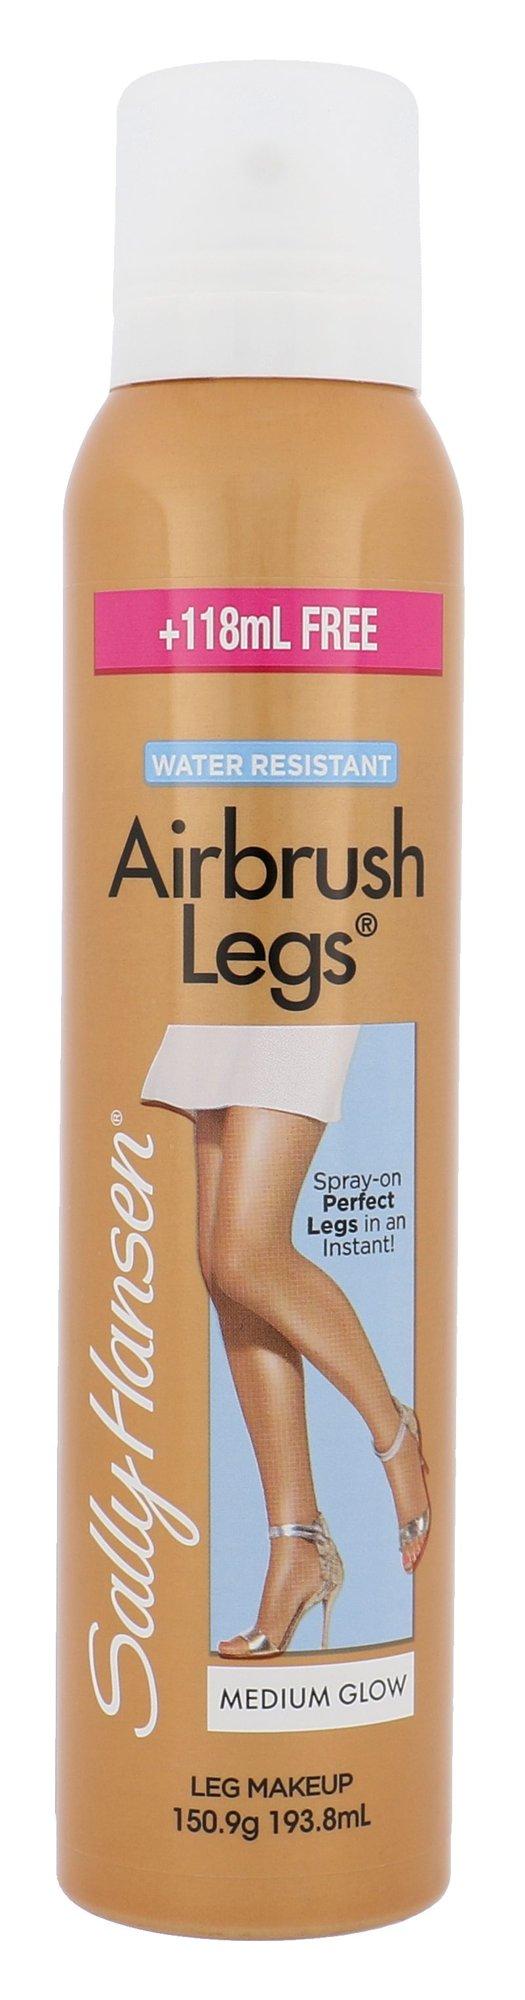 Sally Hansen Airbrush Legs Cosmetic 193,8ml Medium Glow